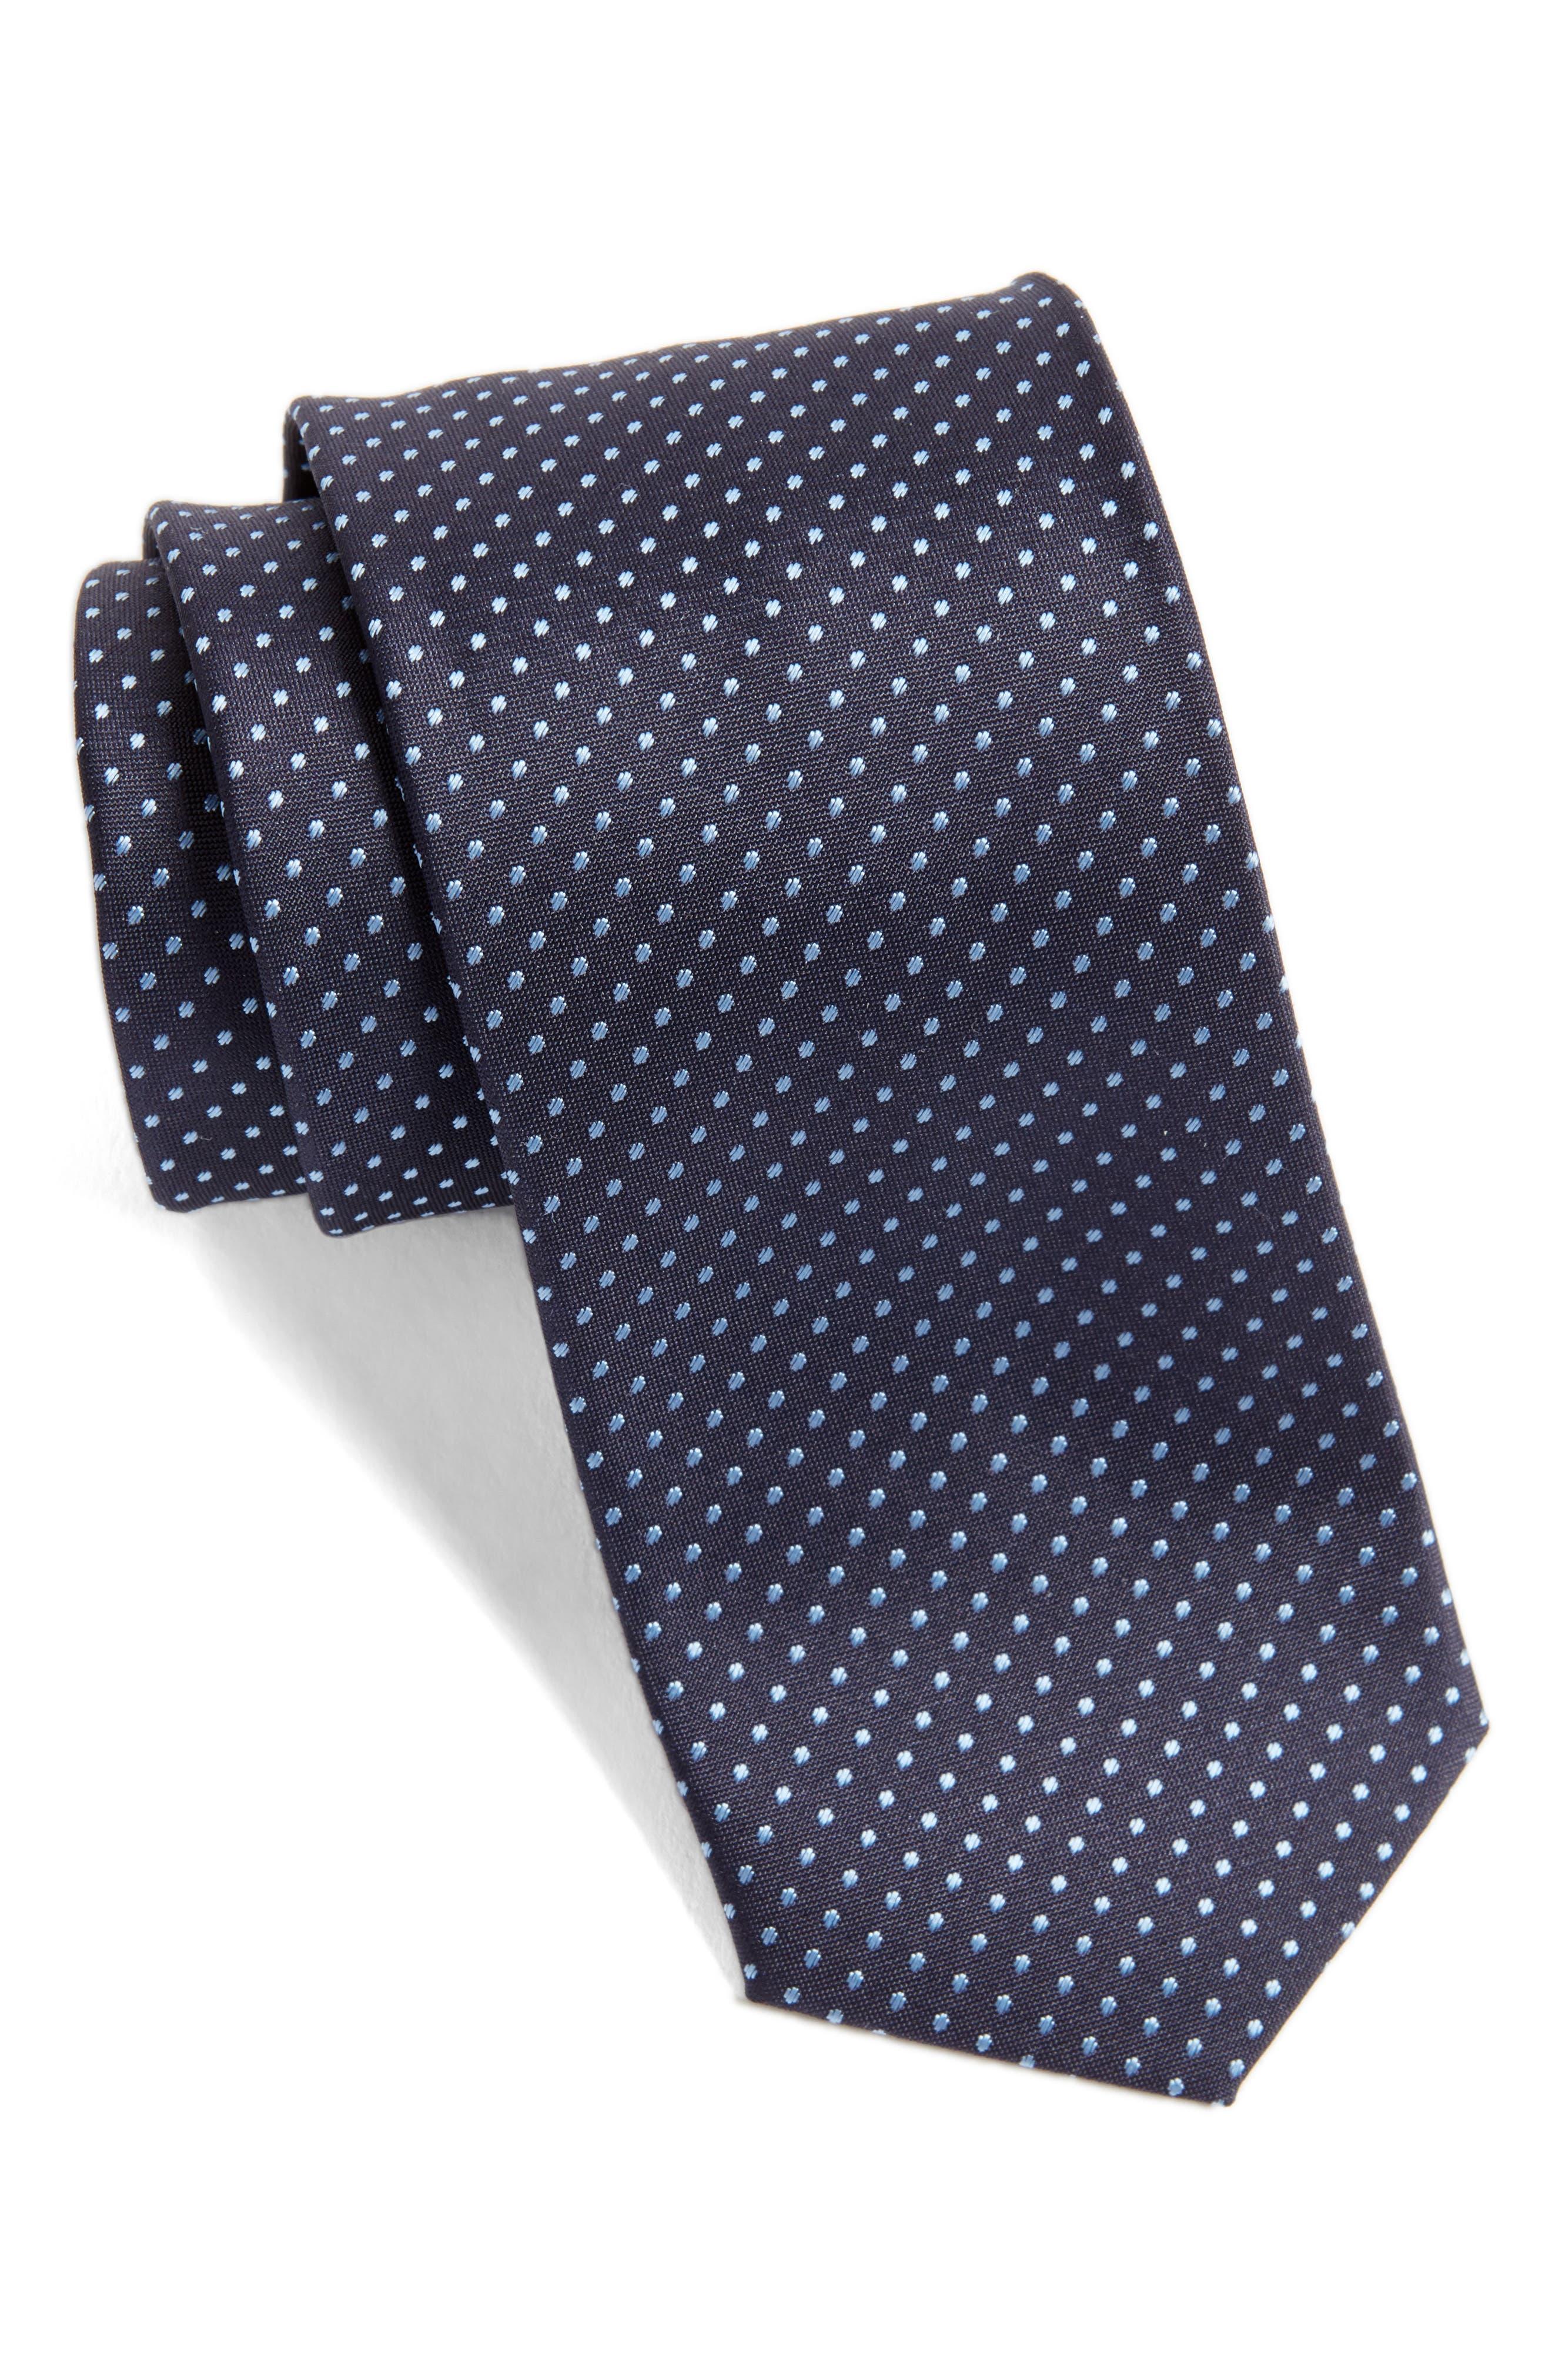 Alternate Image 1 Selected - BOSS Dot Silk Skinny Tie